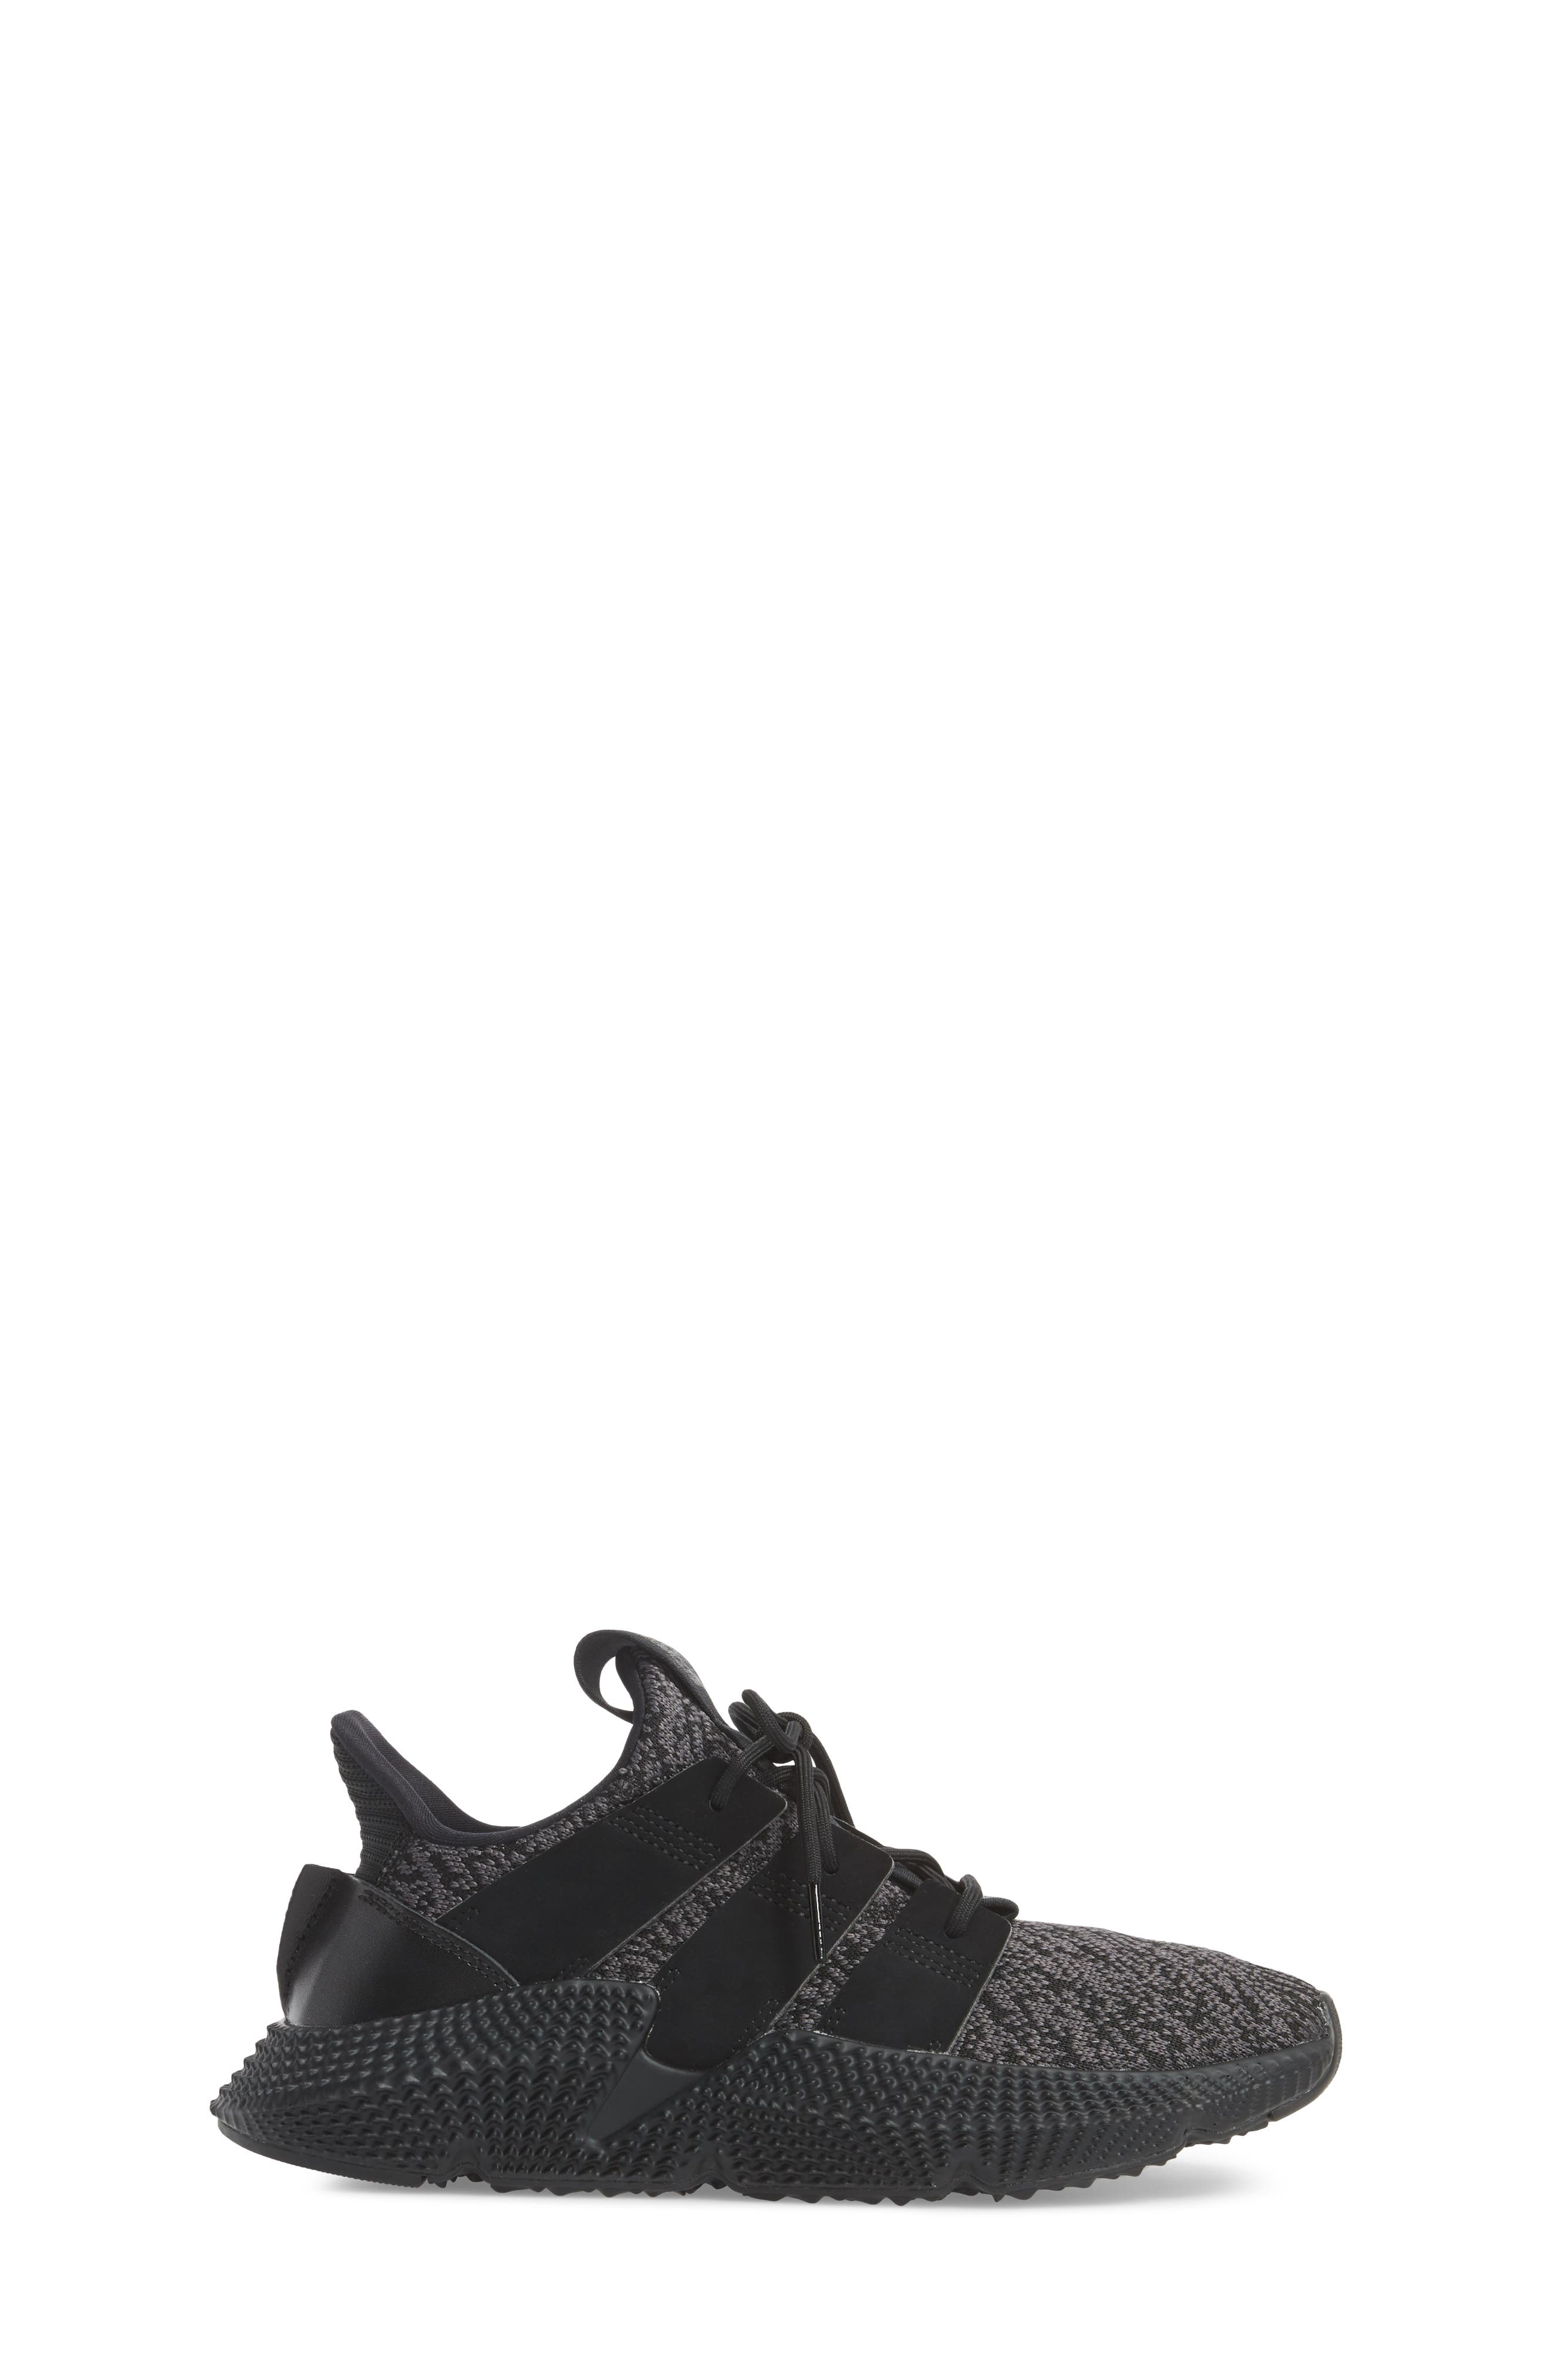 Prophere Sneaker,                             Alternate thumbnail 3, color,                             001